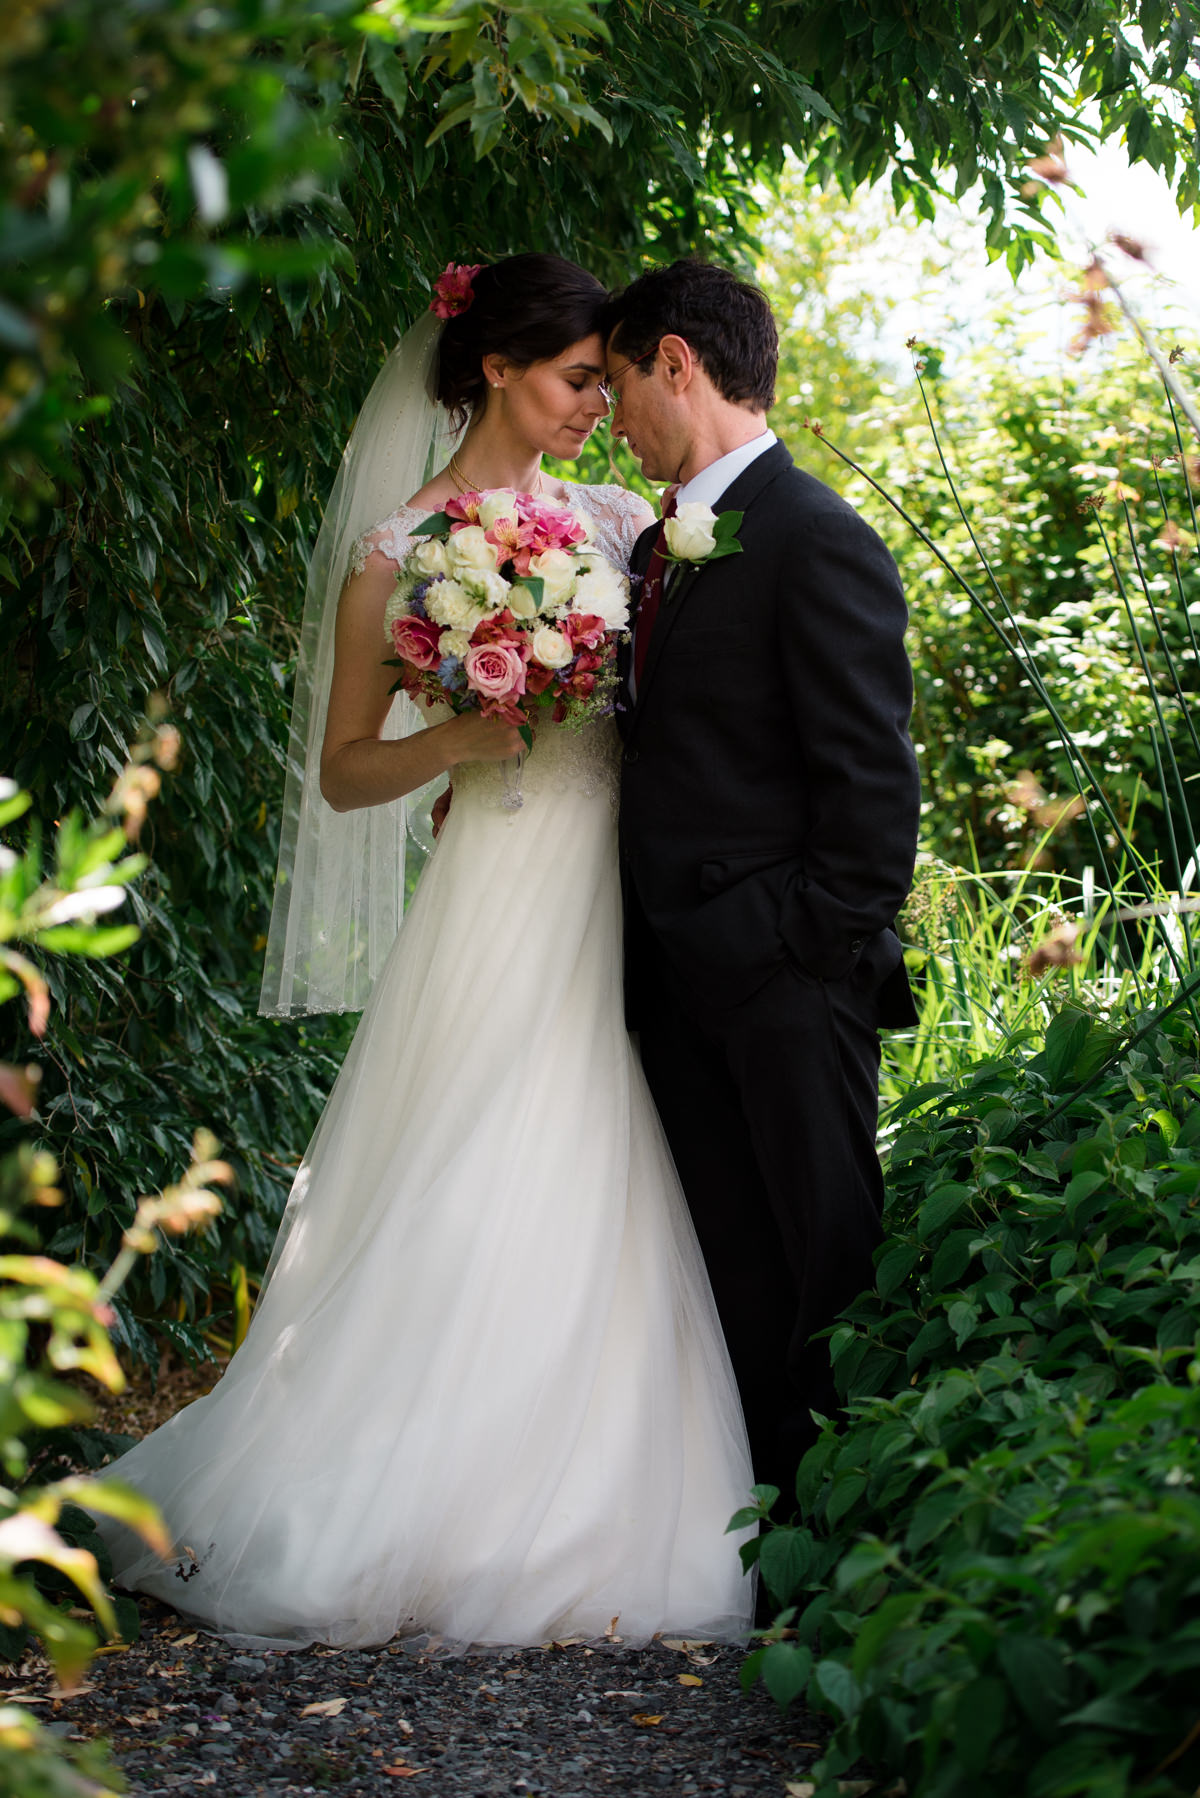 Andrew Tat - Documentary Wedding Photography - Kirkland, Washington - Emily & Cuauh - 26.JPG